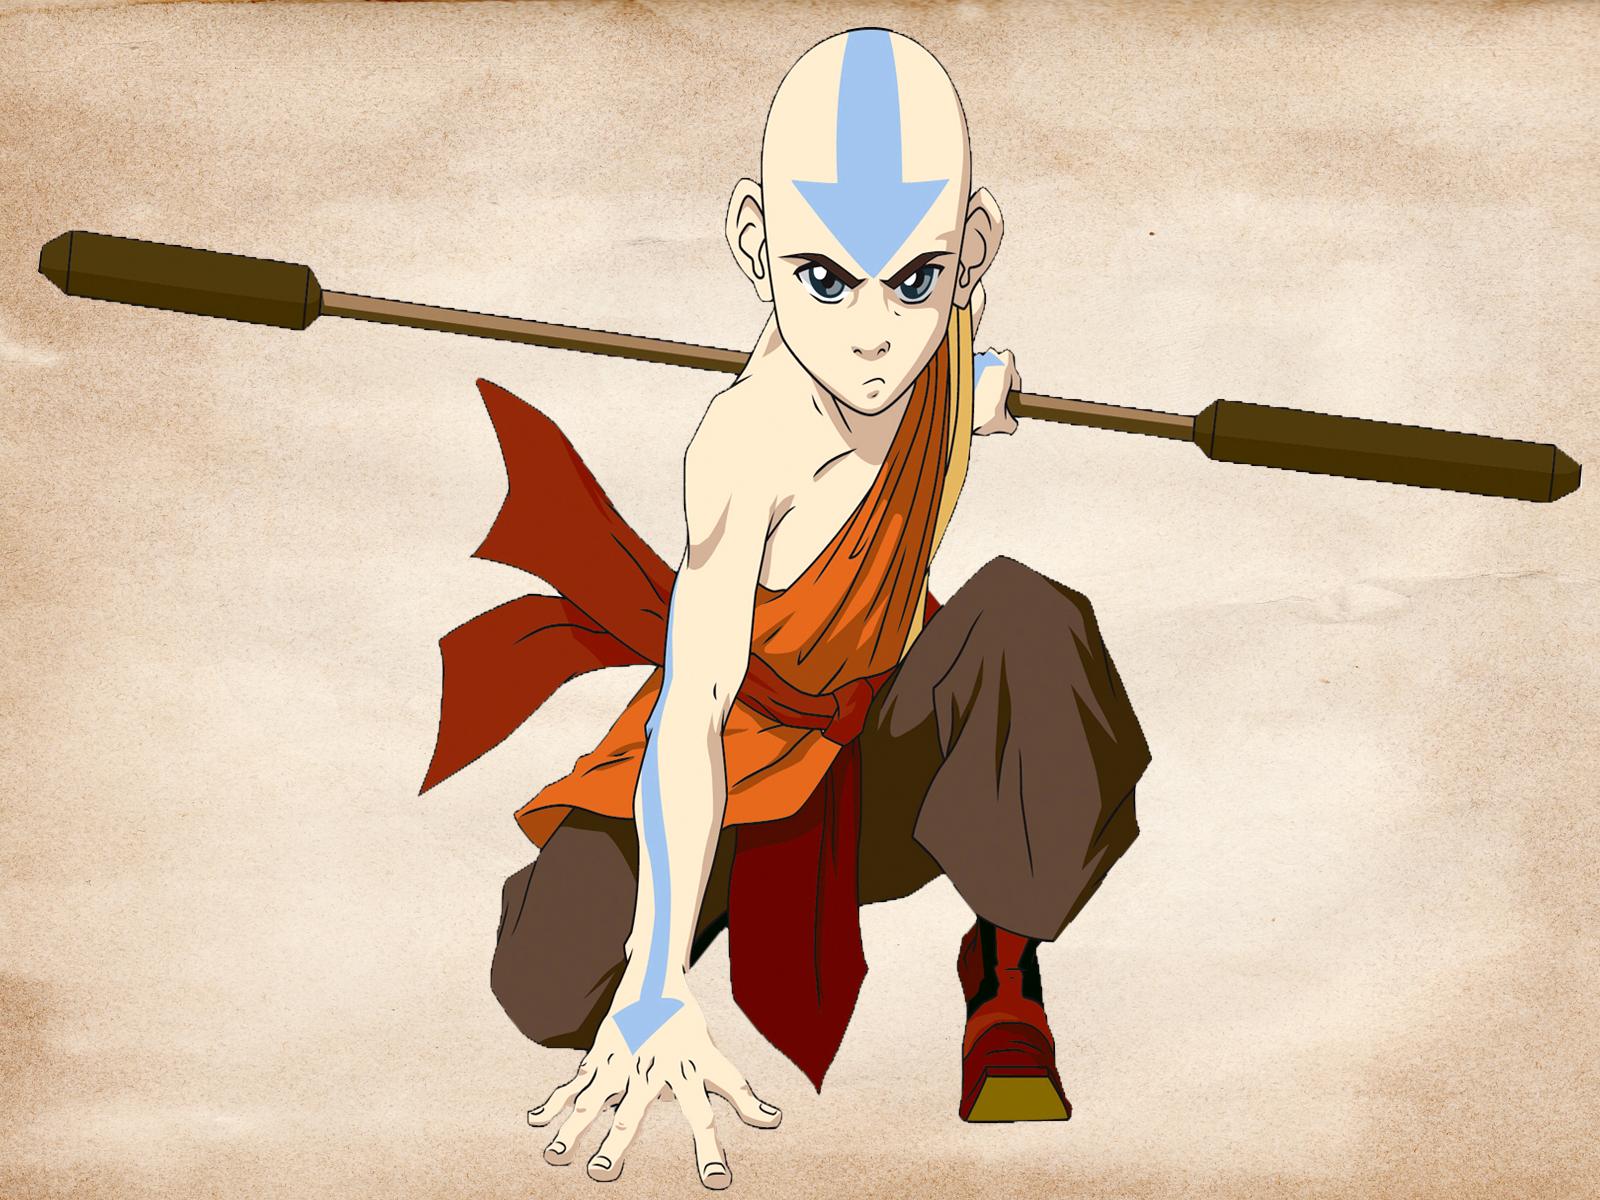 Avatar last airbender cartoon